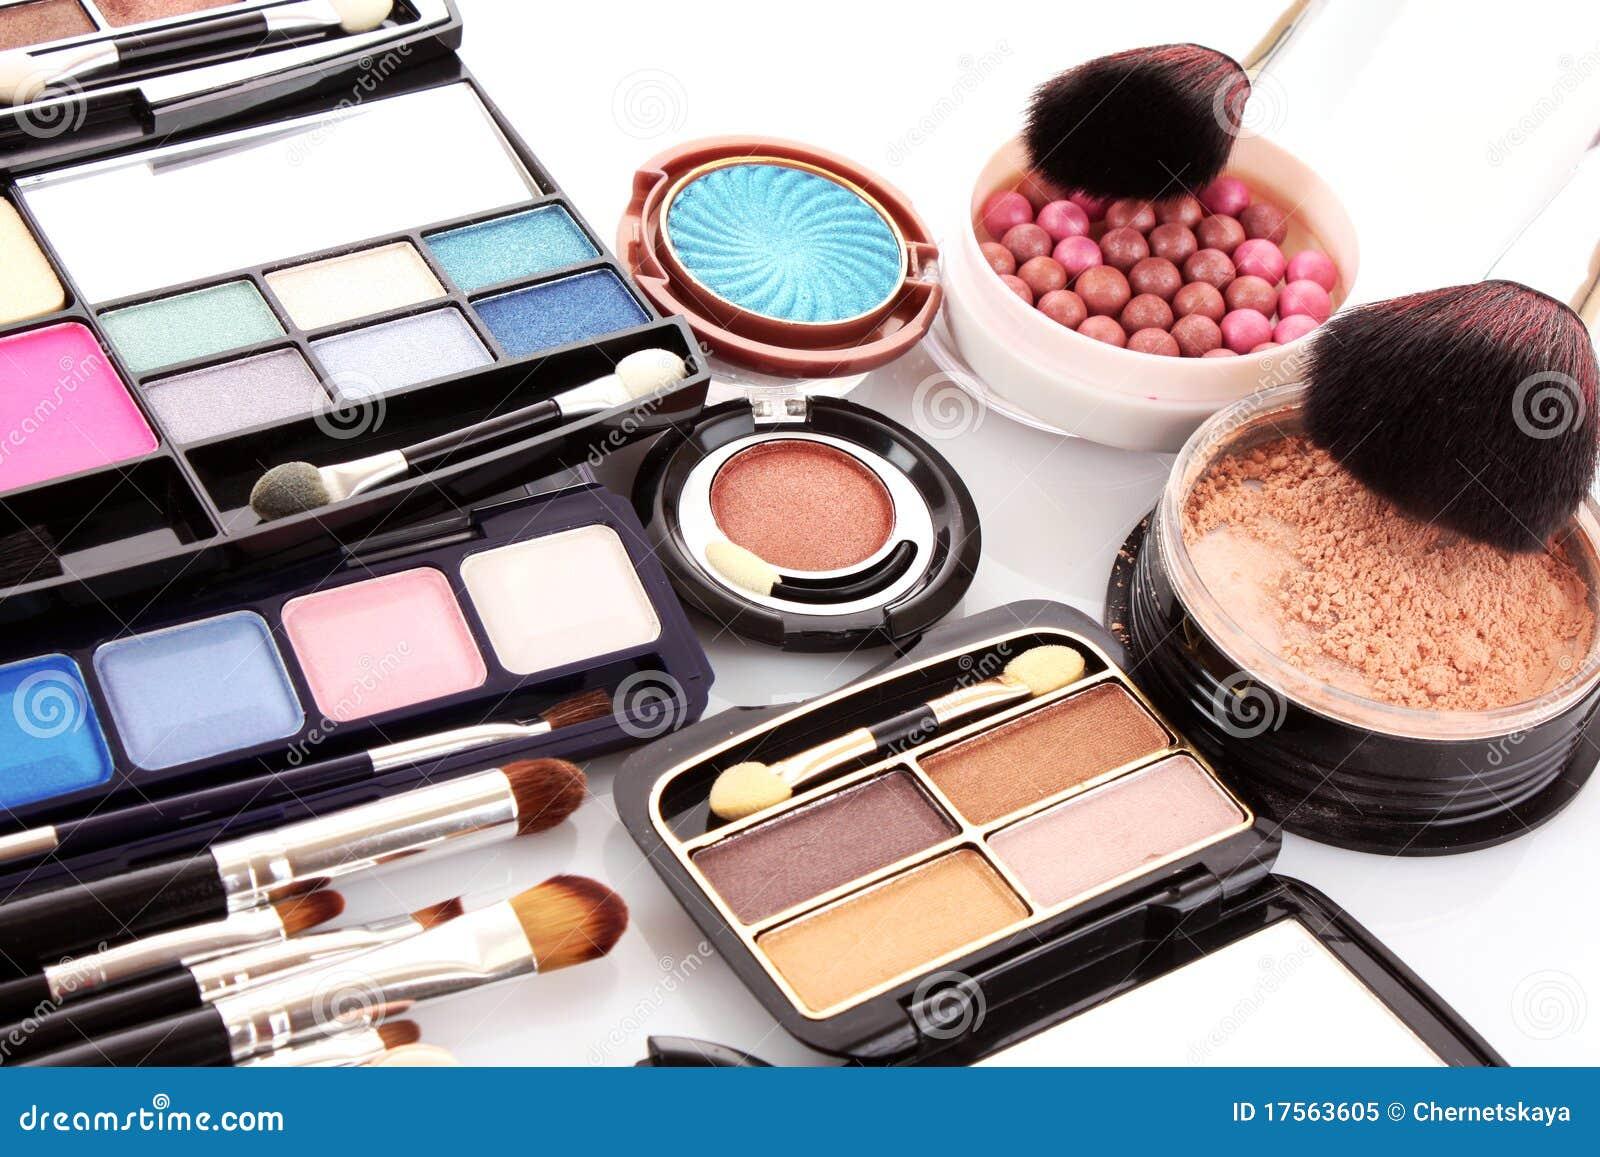 Many Professional Cosmetics Royalty Free Stock Photo Image 17563605